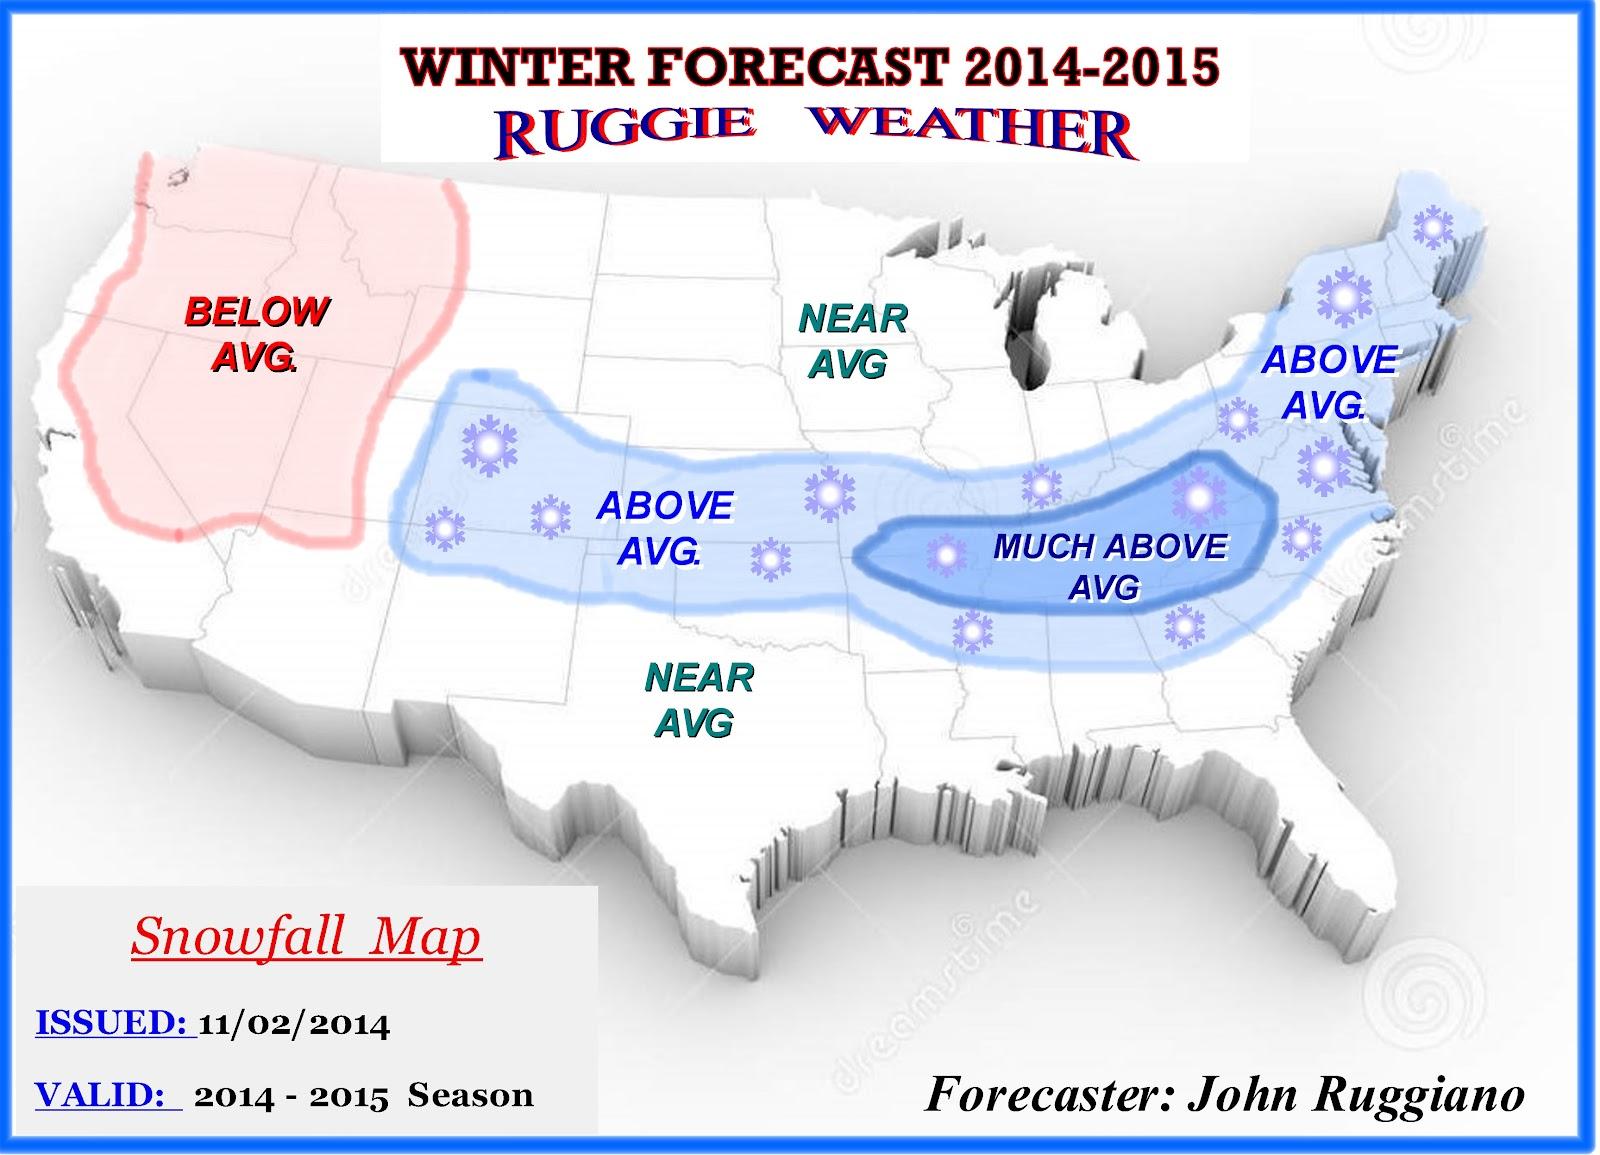 2014-2015 Snowfall Map.jpg